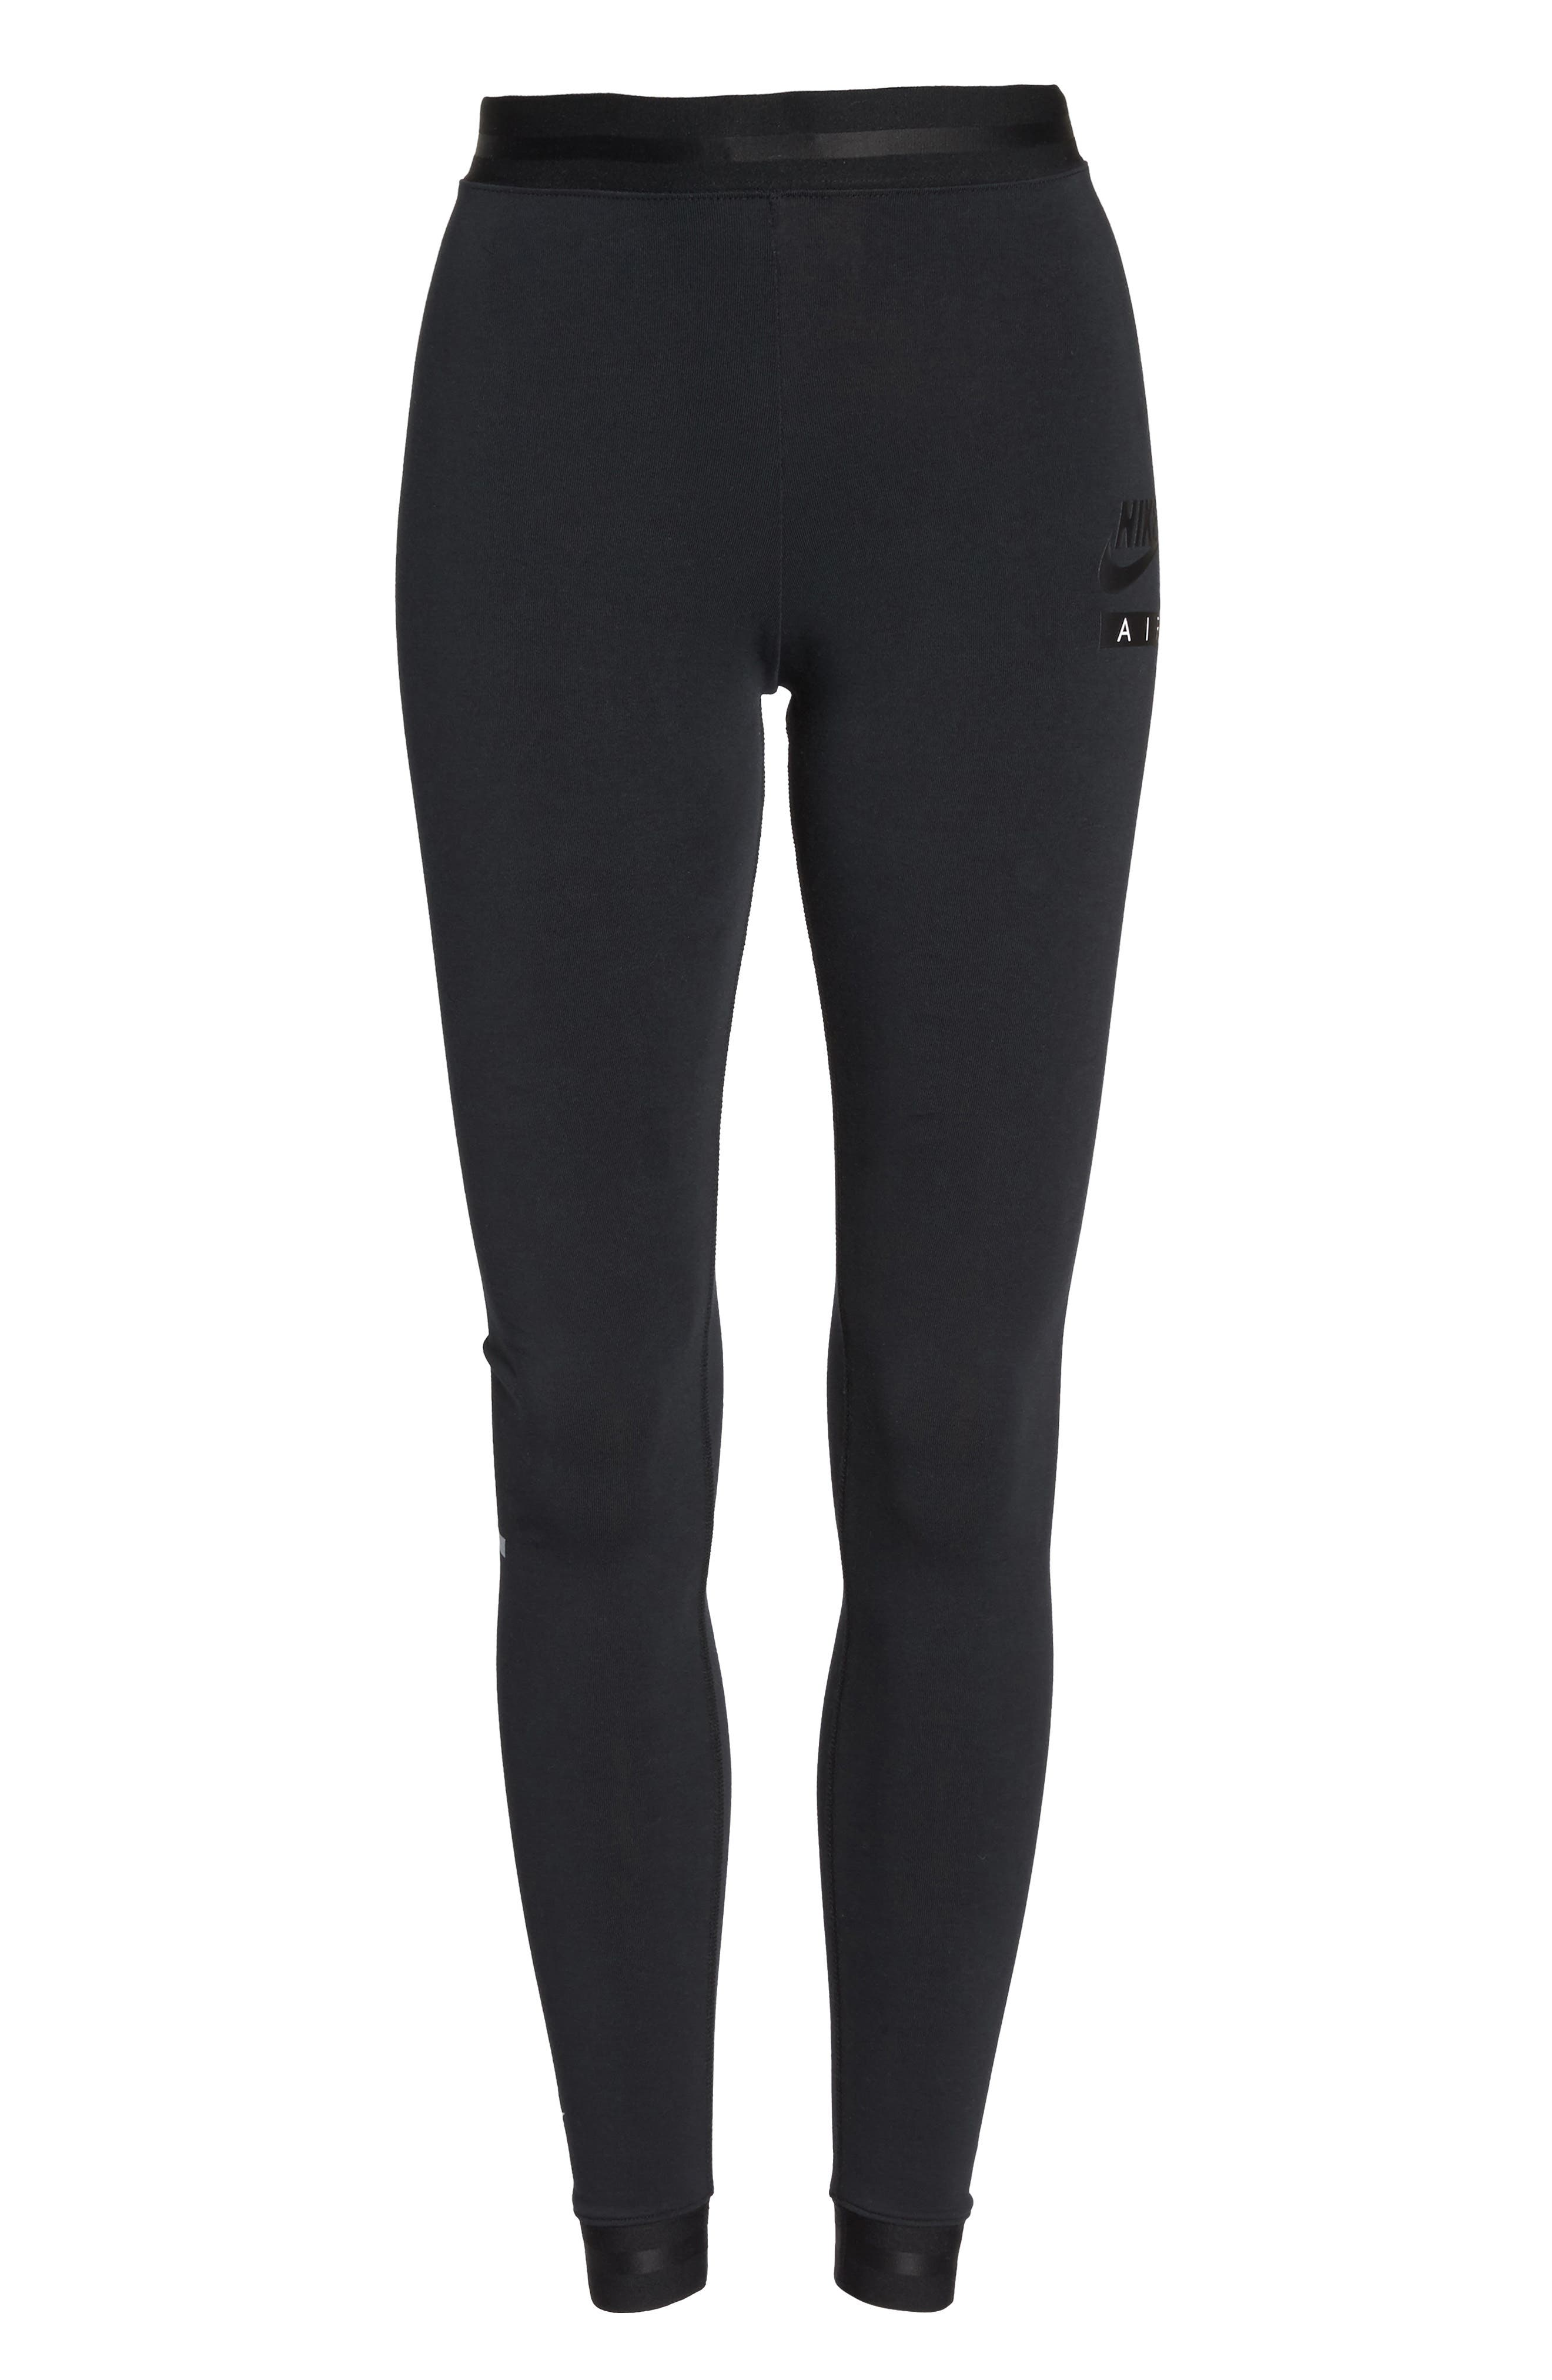 Sportswear Women's Leggings,                             Alternate thumbnail 7, color,                             Black/ Black/ Black